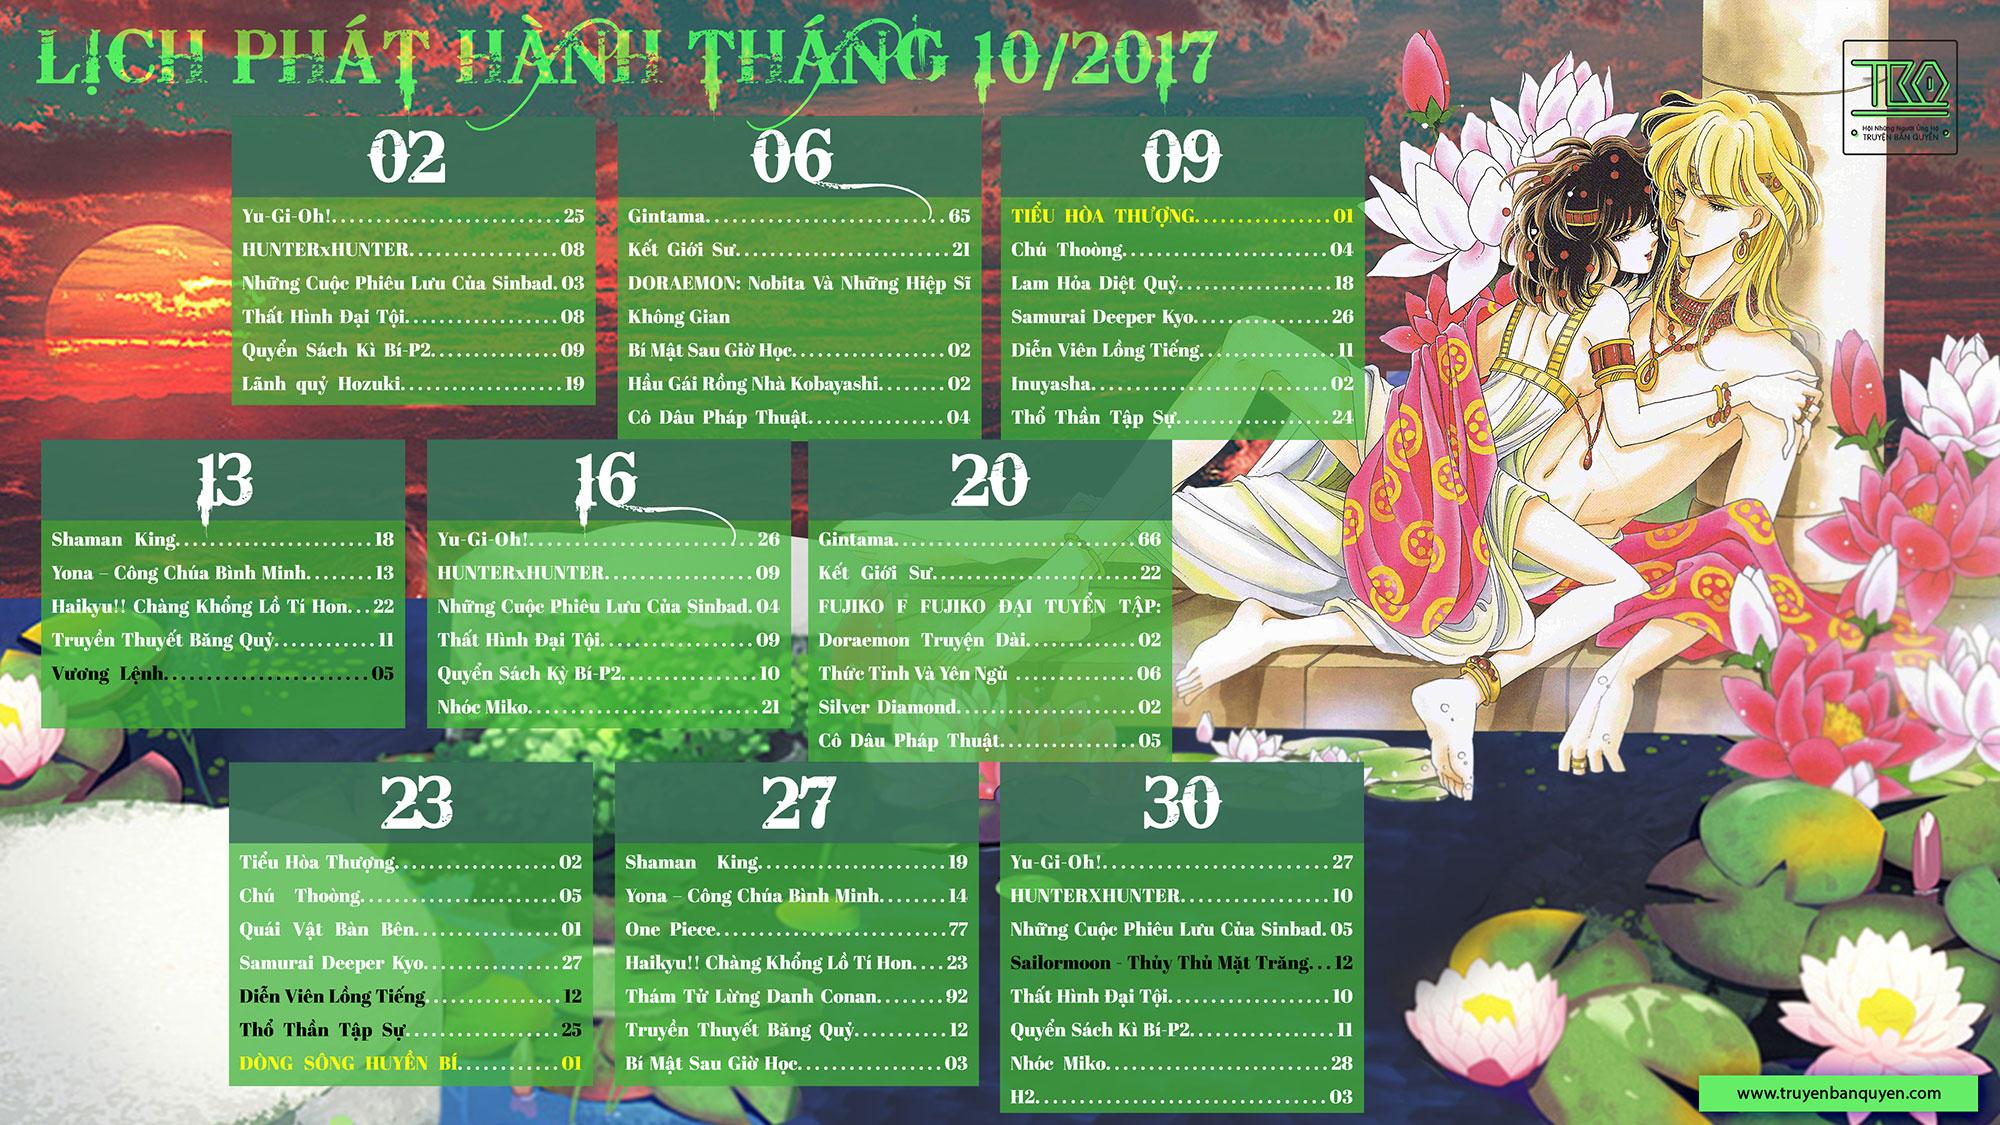 TBQ_LPH_Thang10/2017